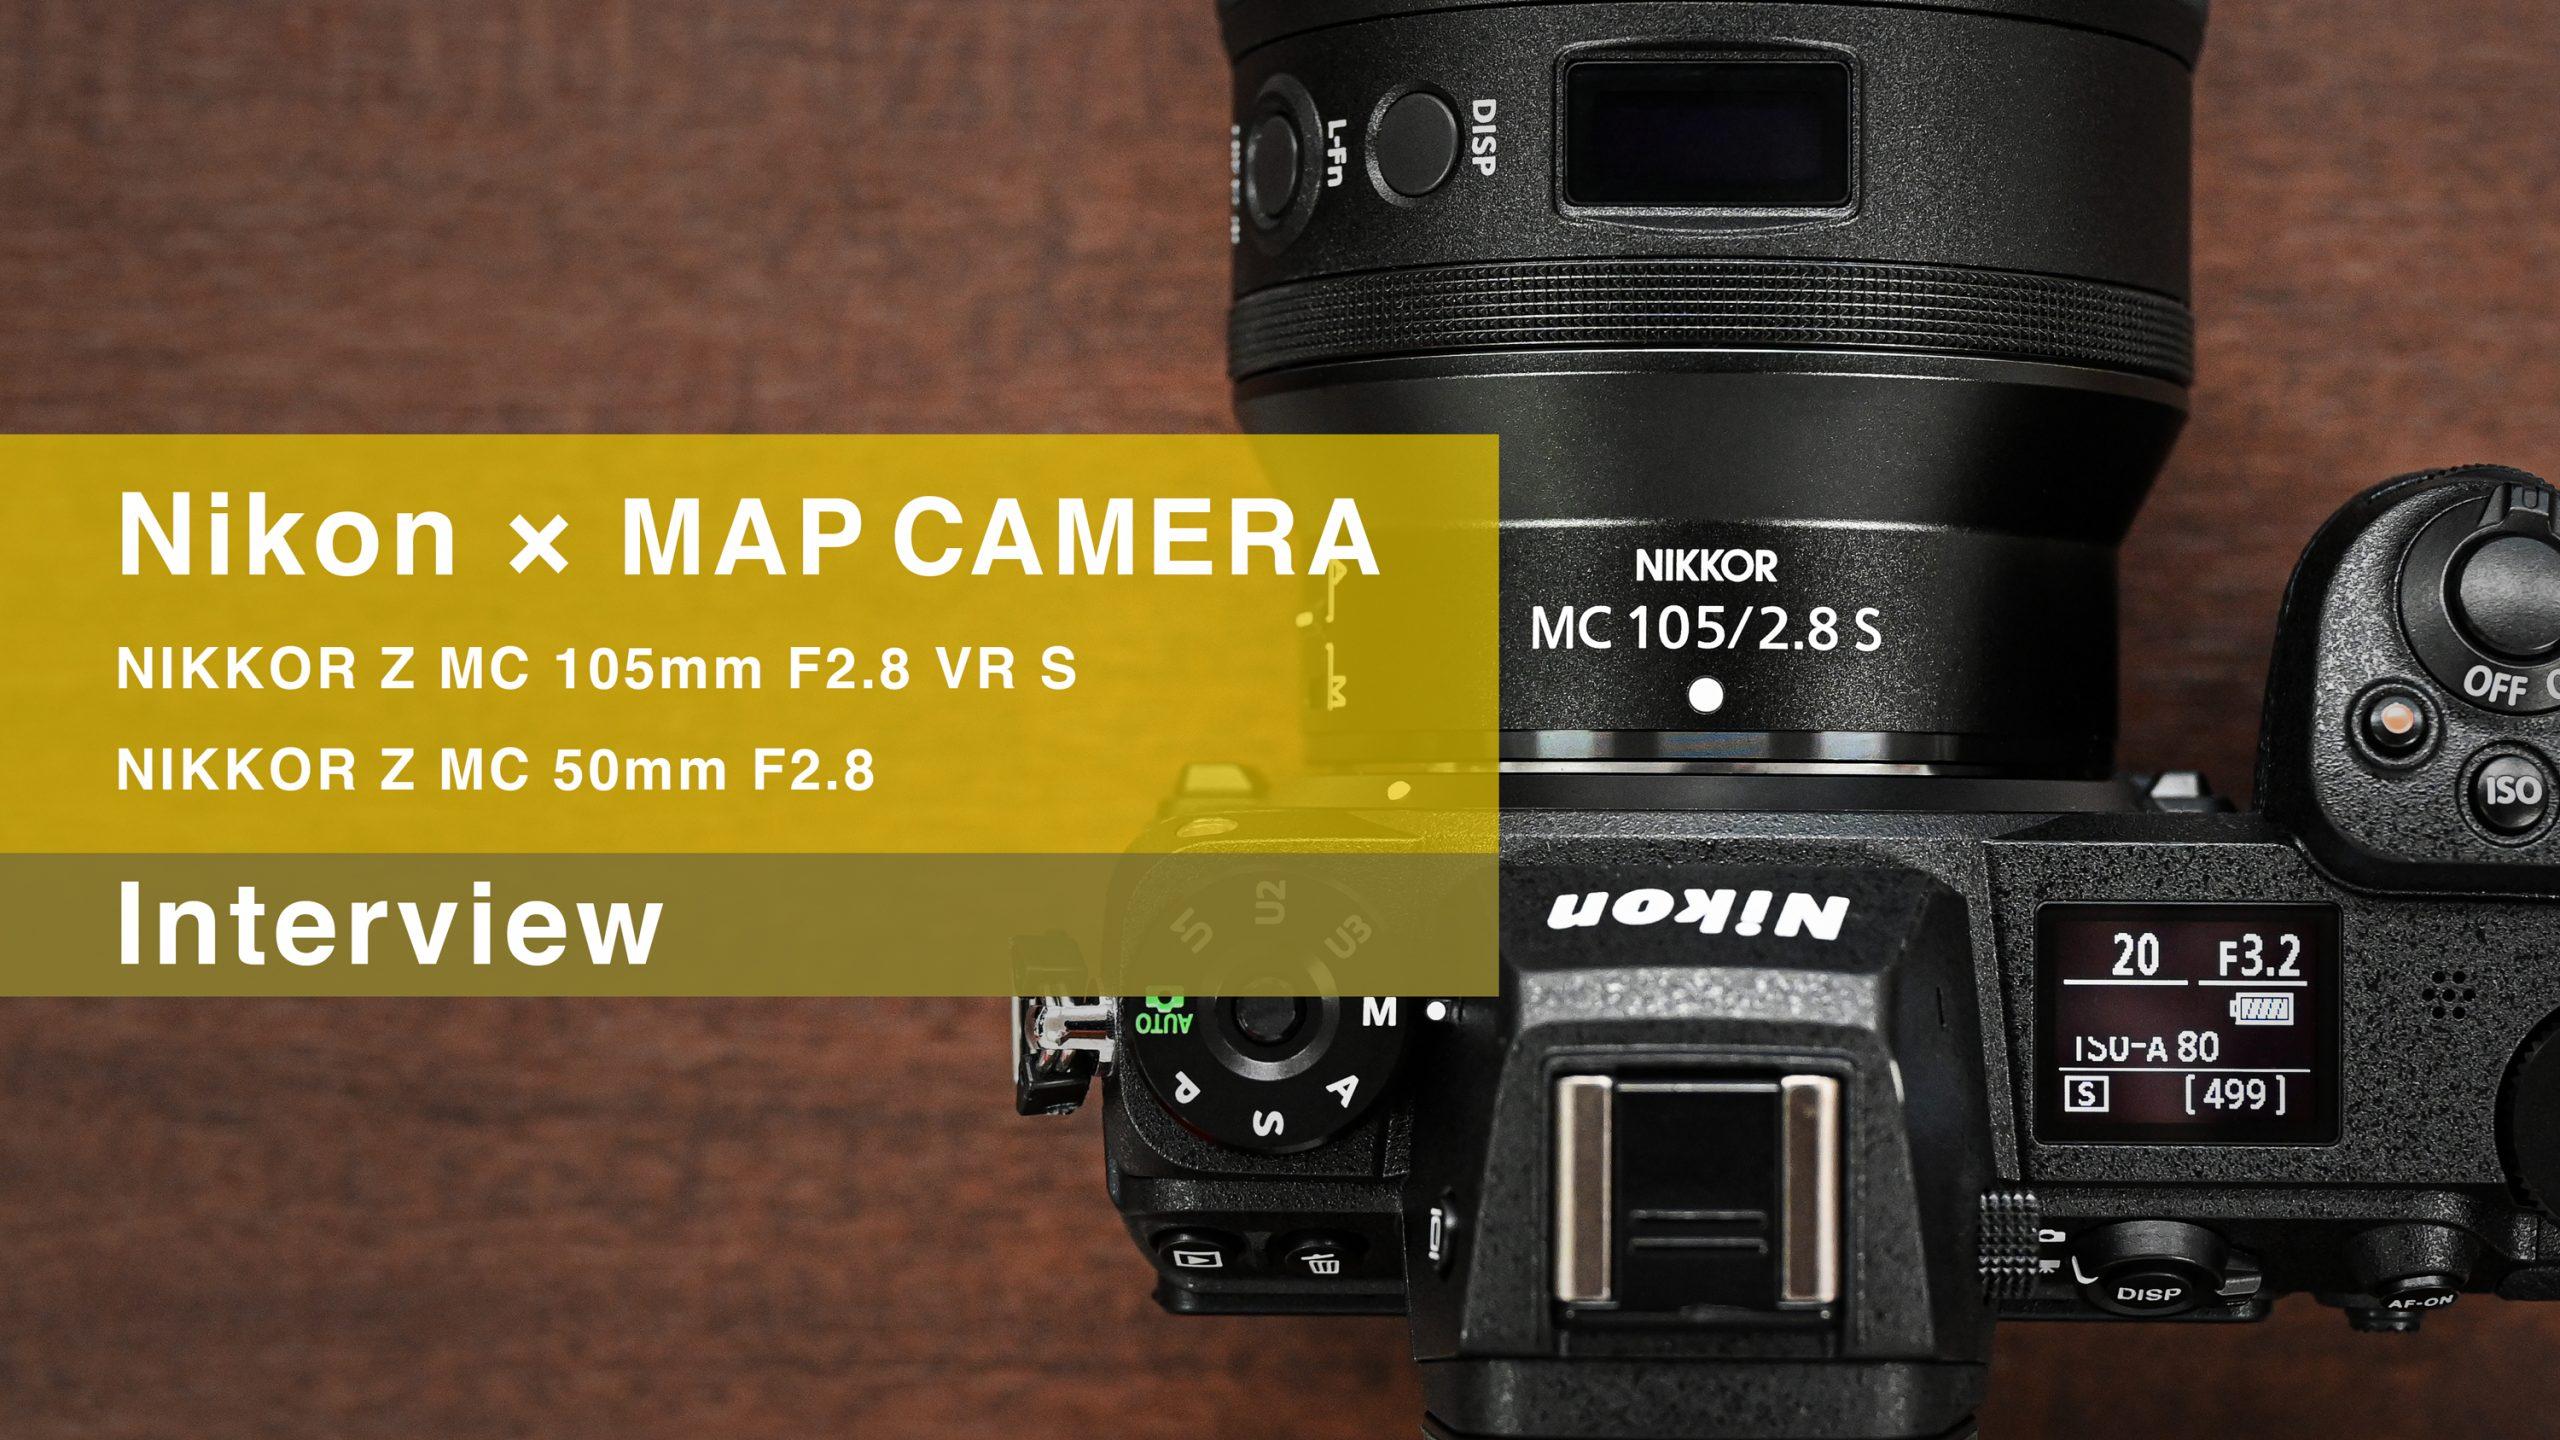 【Nikon】NIKKOR Z  MC 105mm F2.8 VR S / MC 50mm F2.8 開発者インタビュー